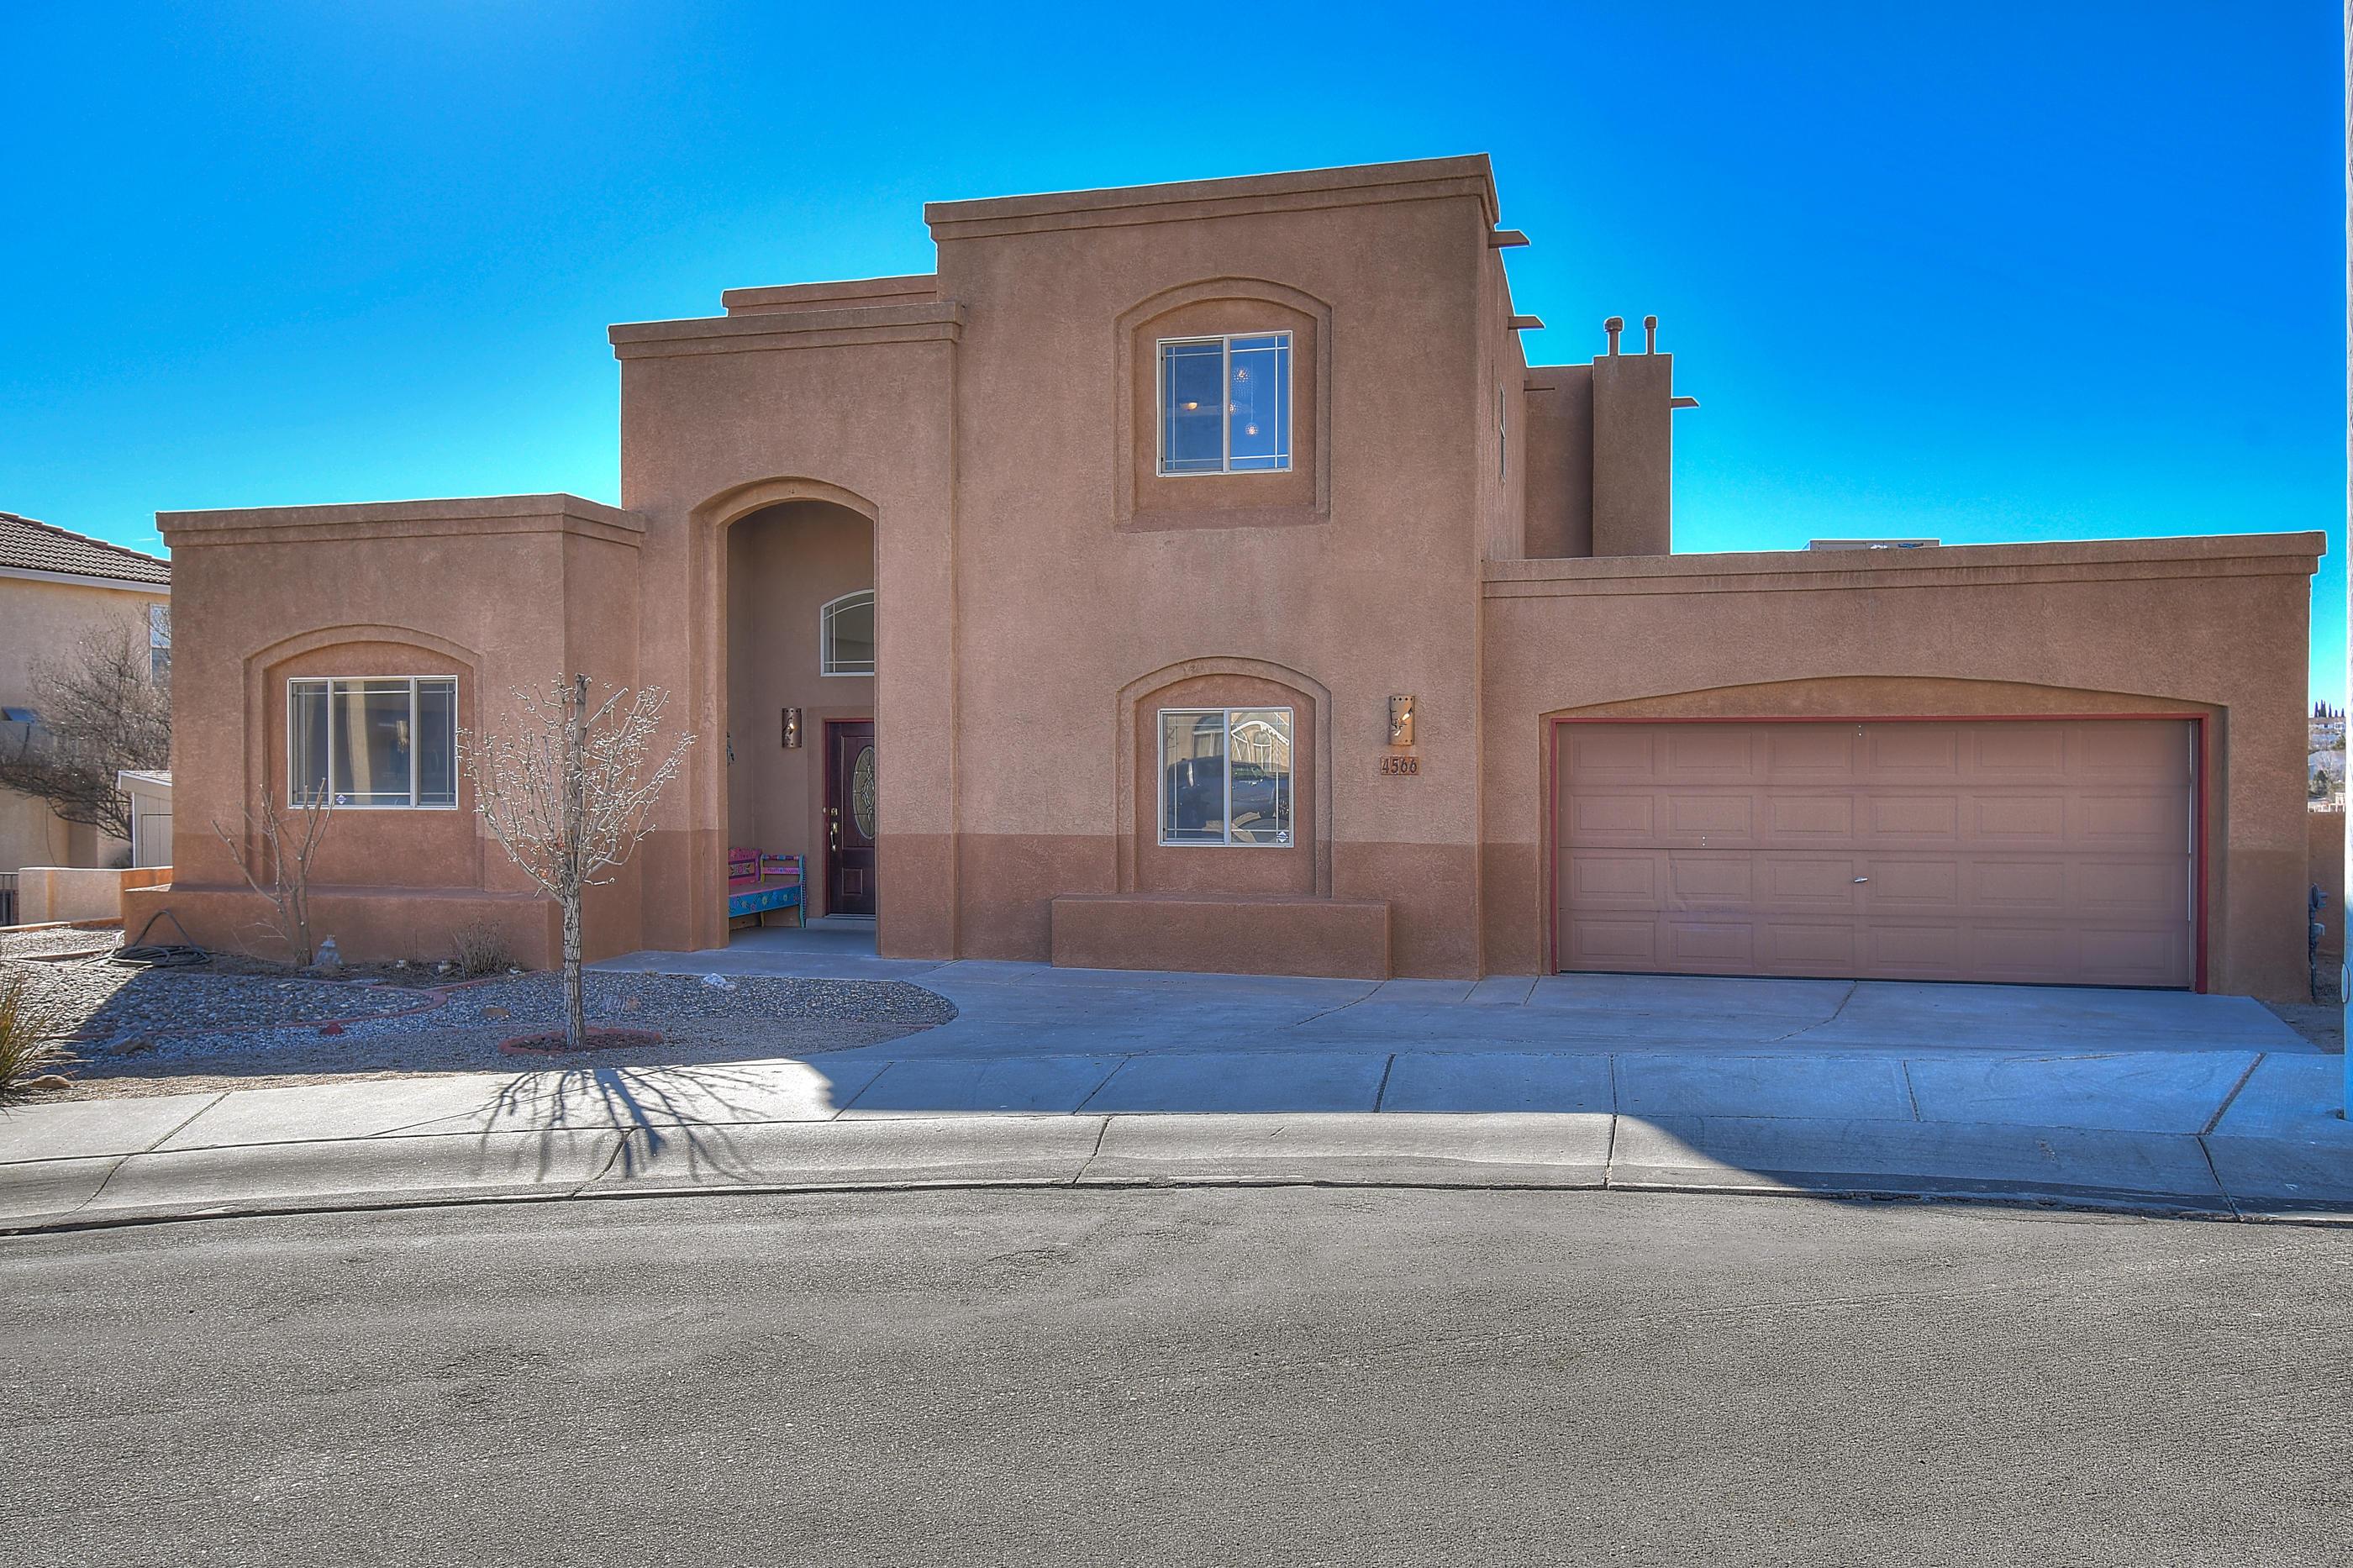 4566 NW Magic Sky Court, Northwest Albuquerque and Northwest Heights, New Mexico